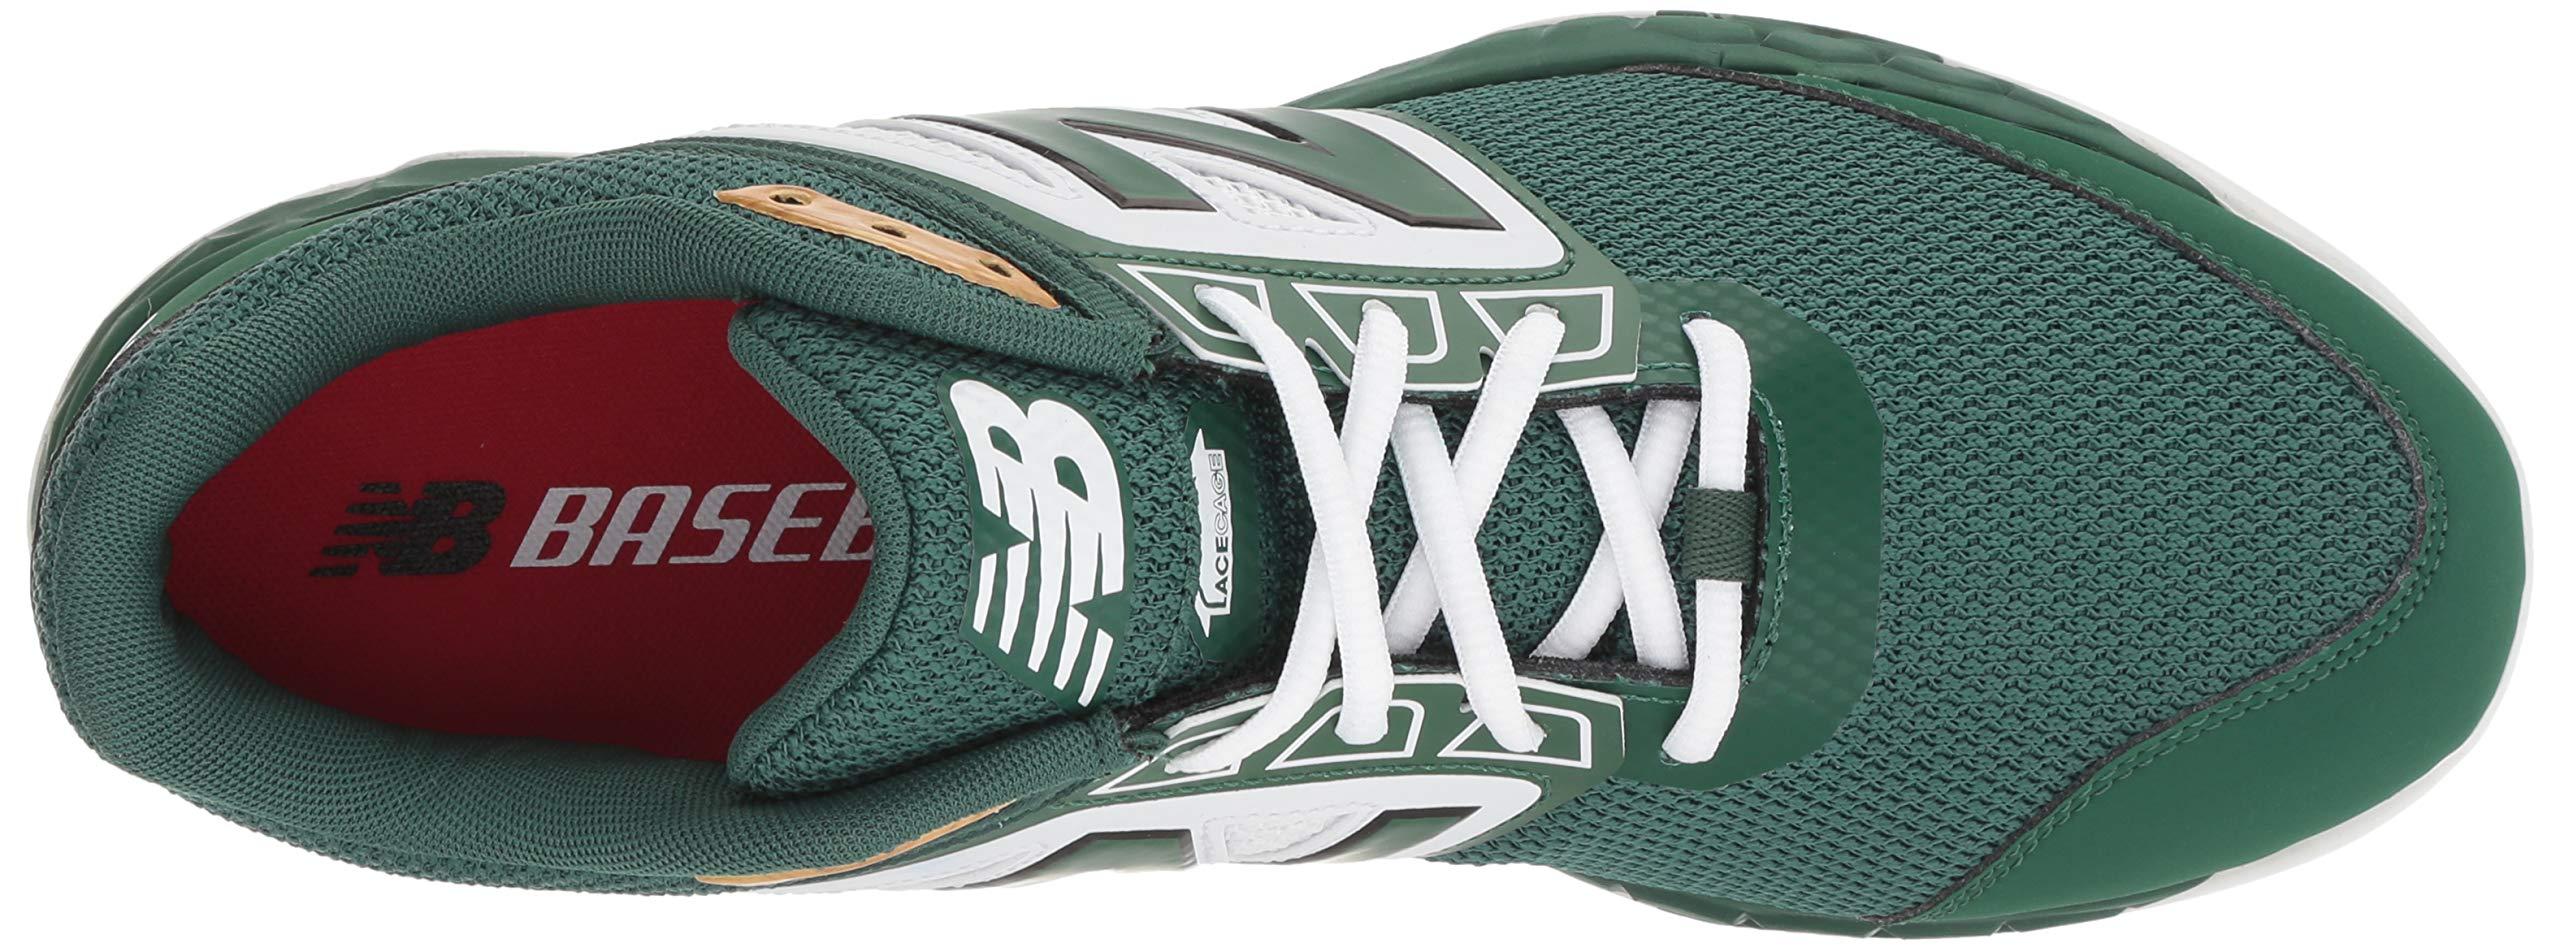 New Balance Men's 3000v4 Turf Baseball Shoe, Green/White, 5 D US by New Balance (Image #8)